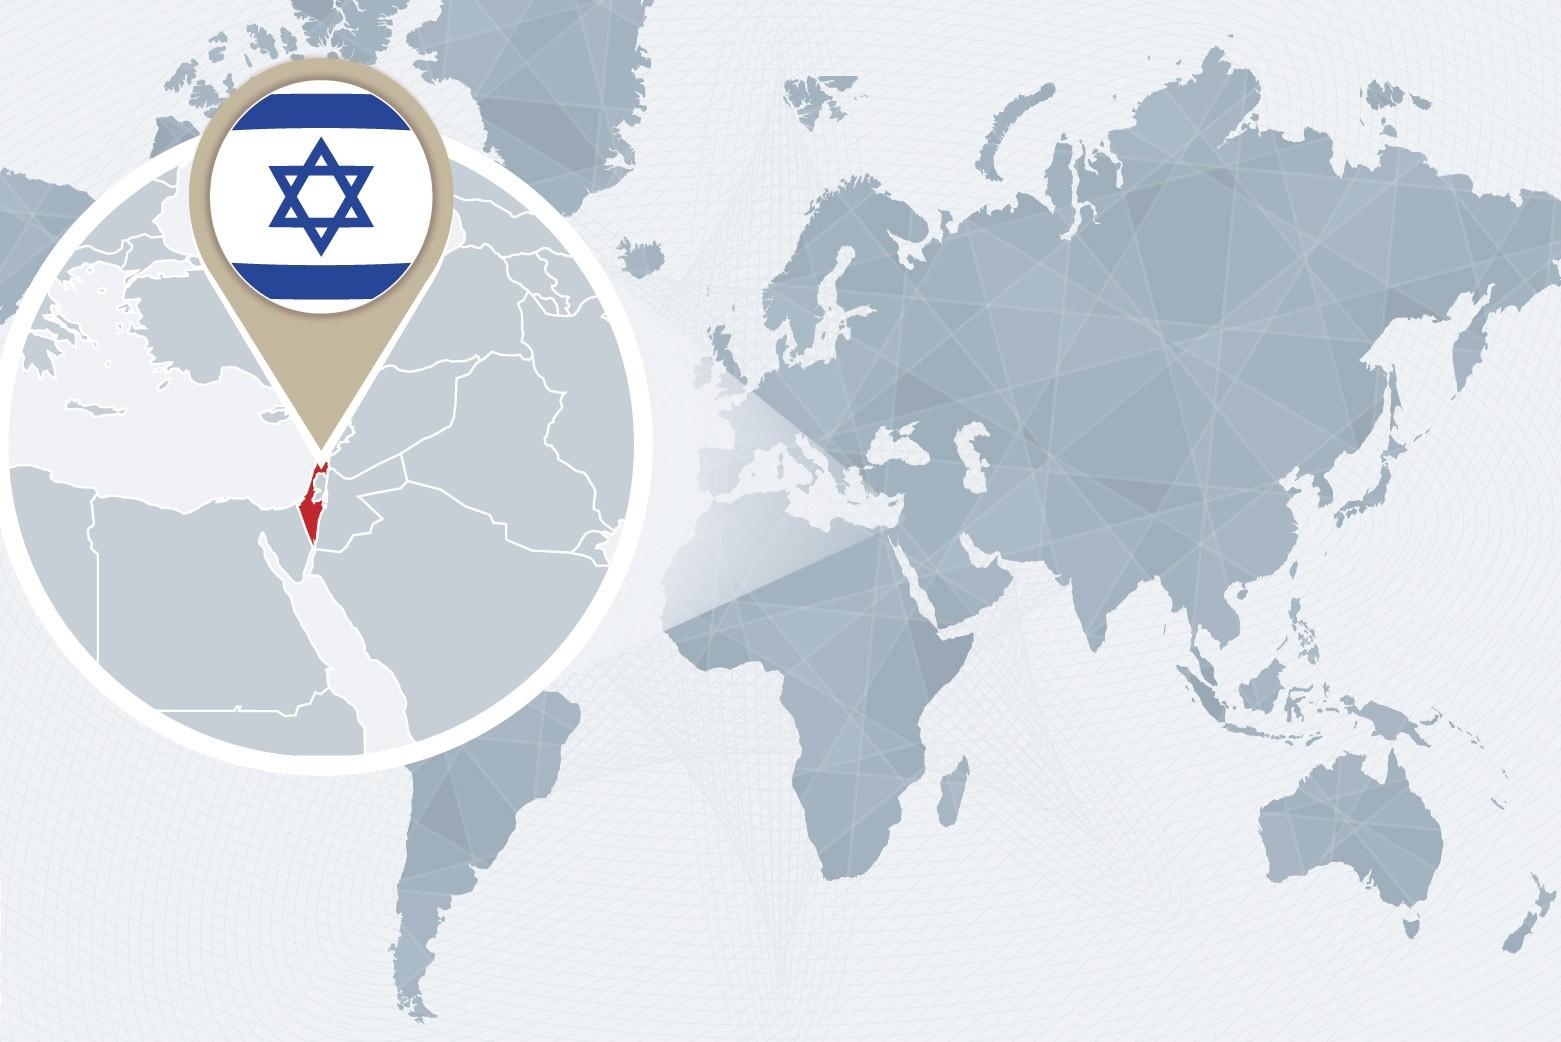 Israel world map